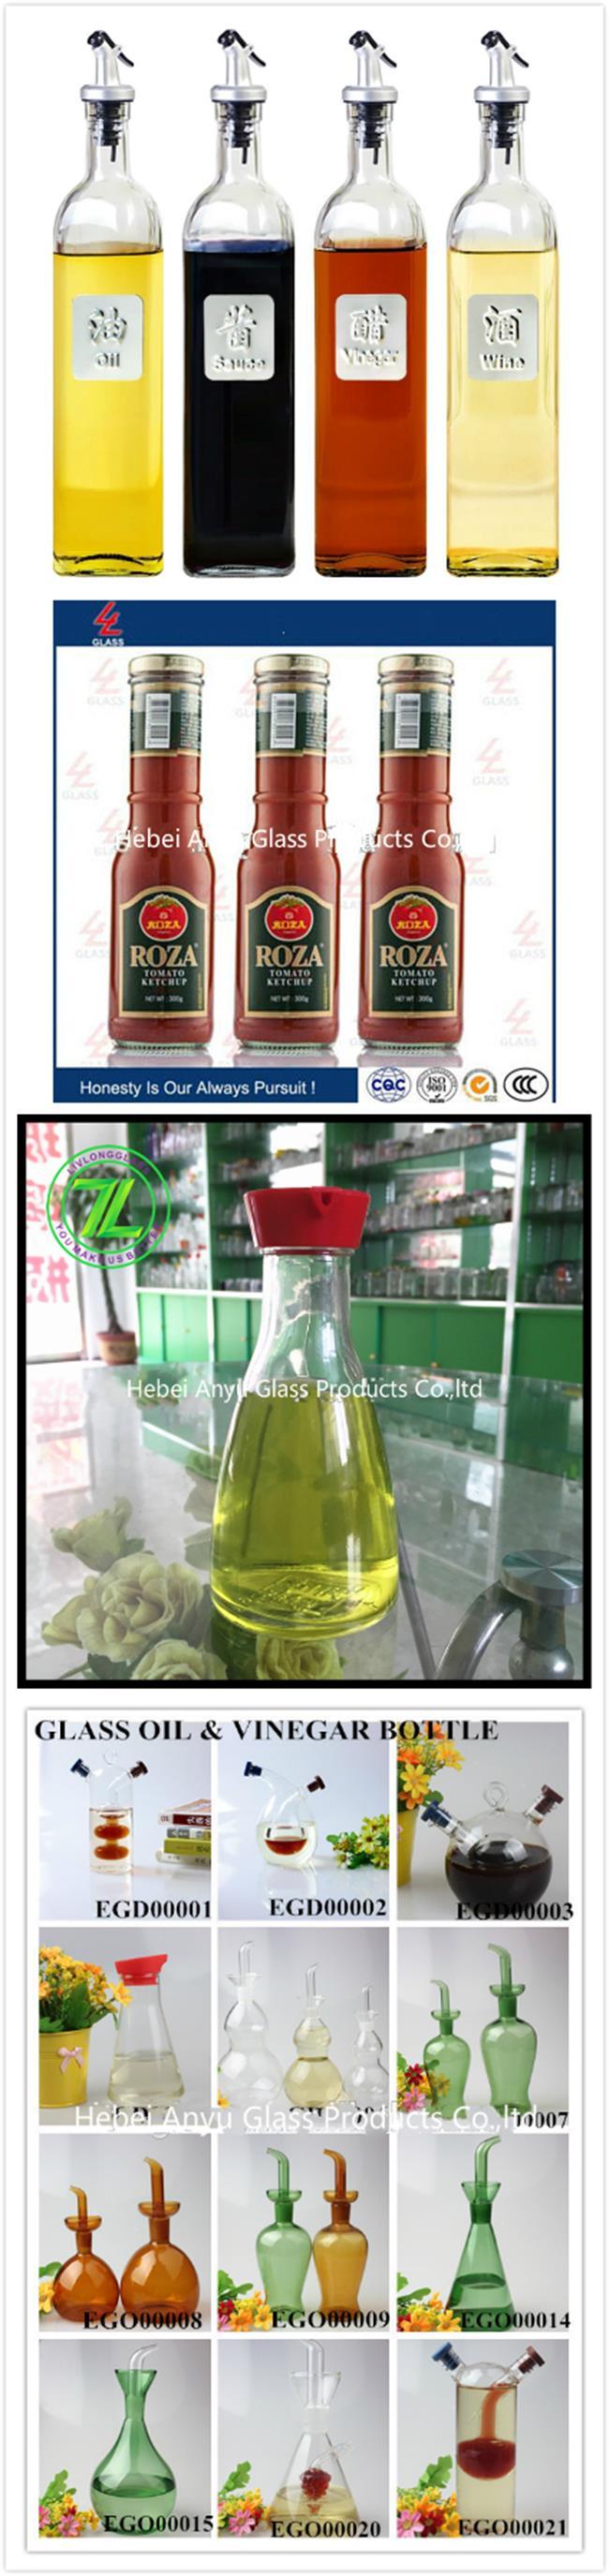 Olive Oil & Vinegar Sprayer Glass Bottle with Adjustable Flow Control for Kitchenware Cooking